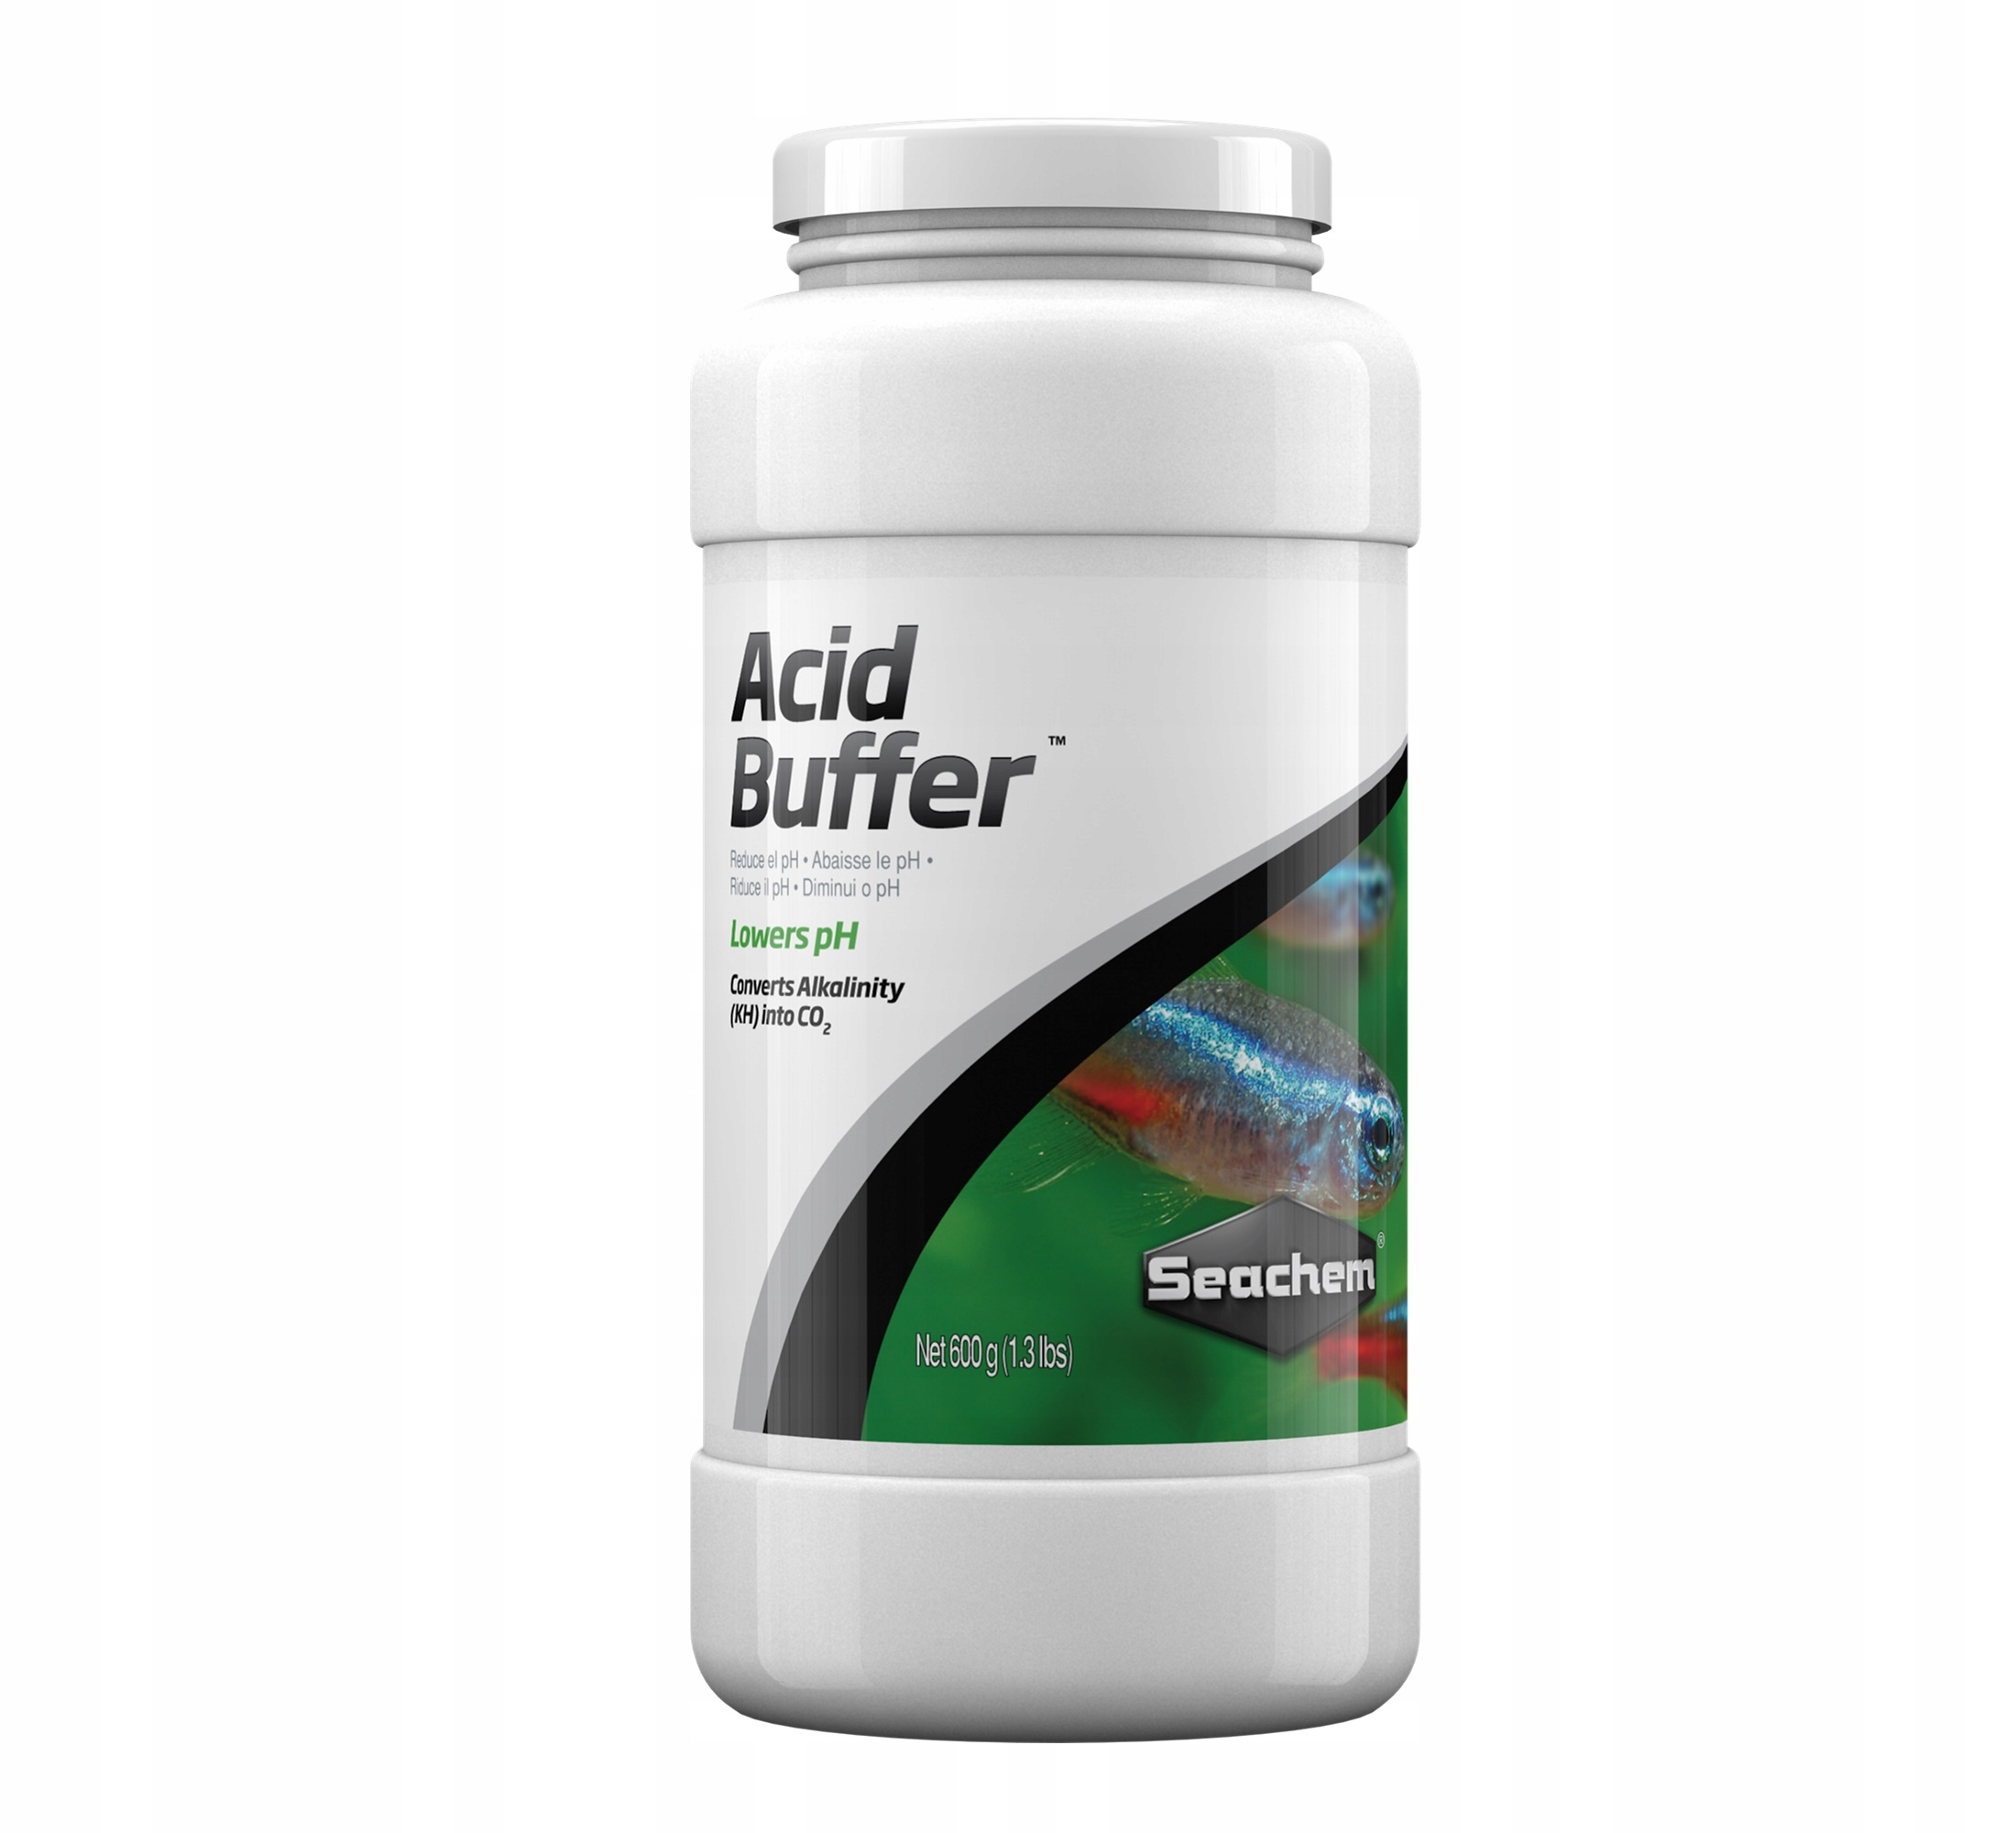 SEACHEM Acid Buffer 600g - obniża pH i KH zakwasza